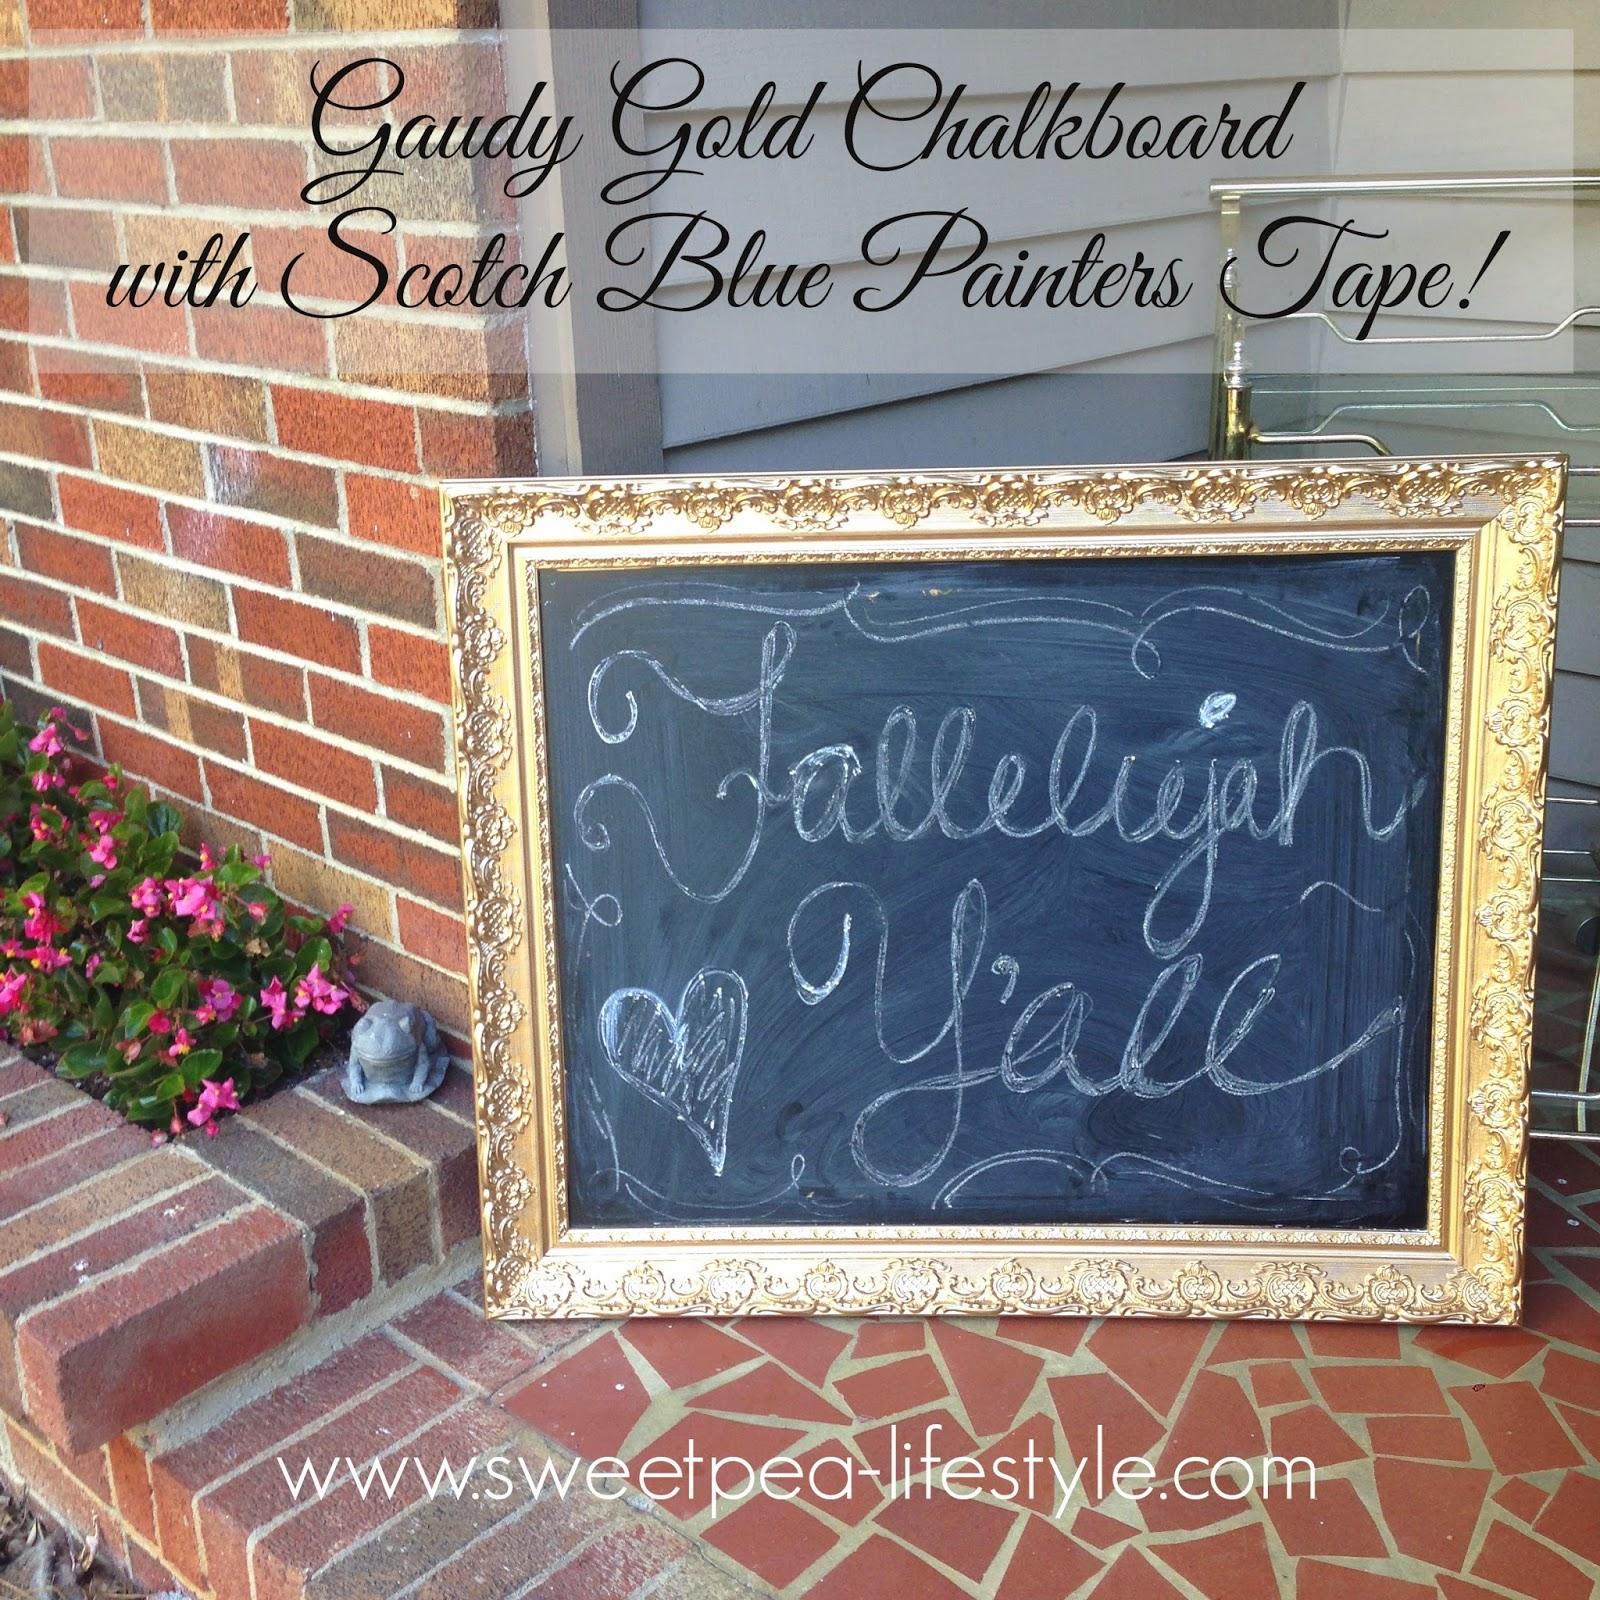 Gaudy Gold Chalkboard with Scotch Blue!